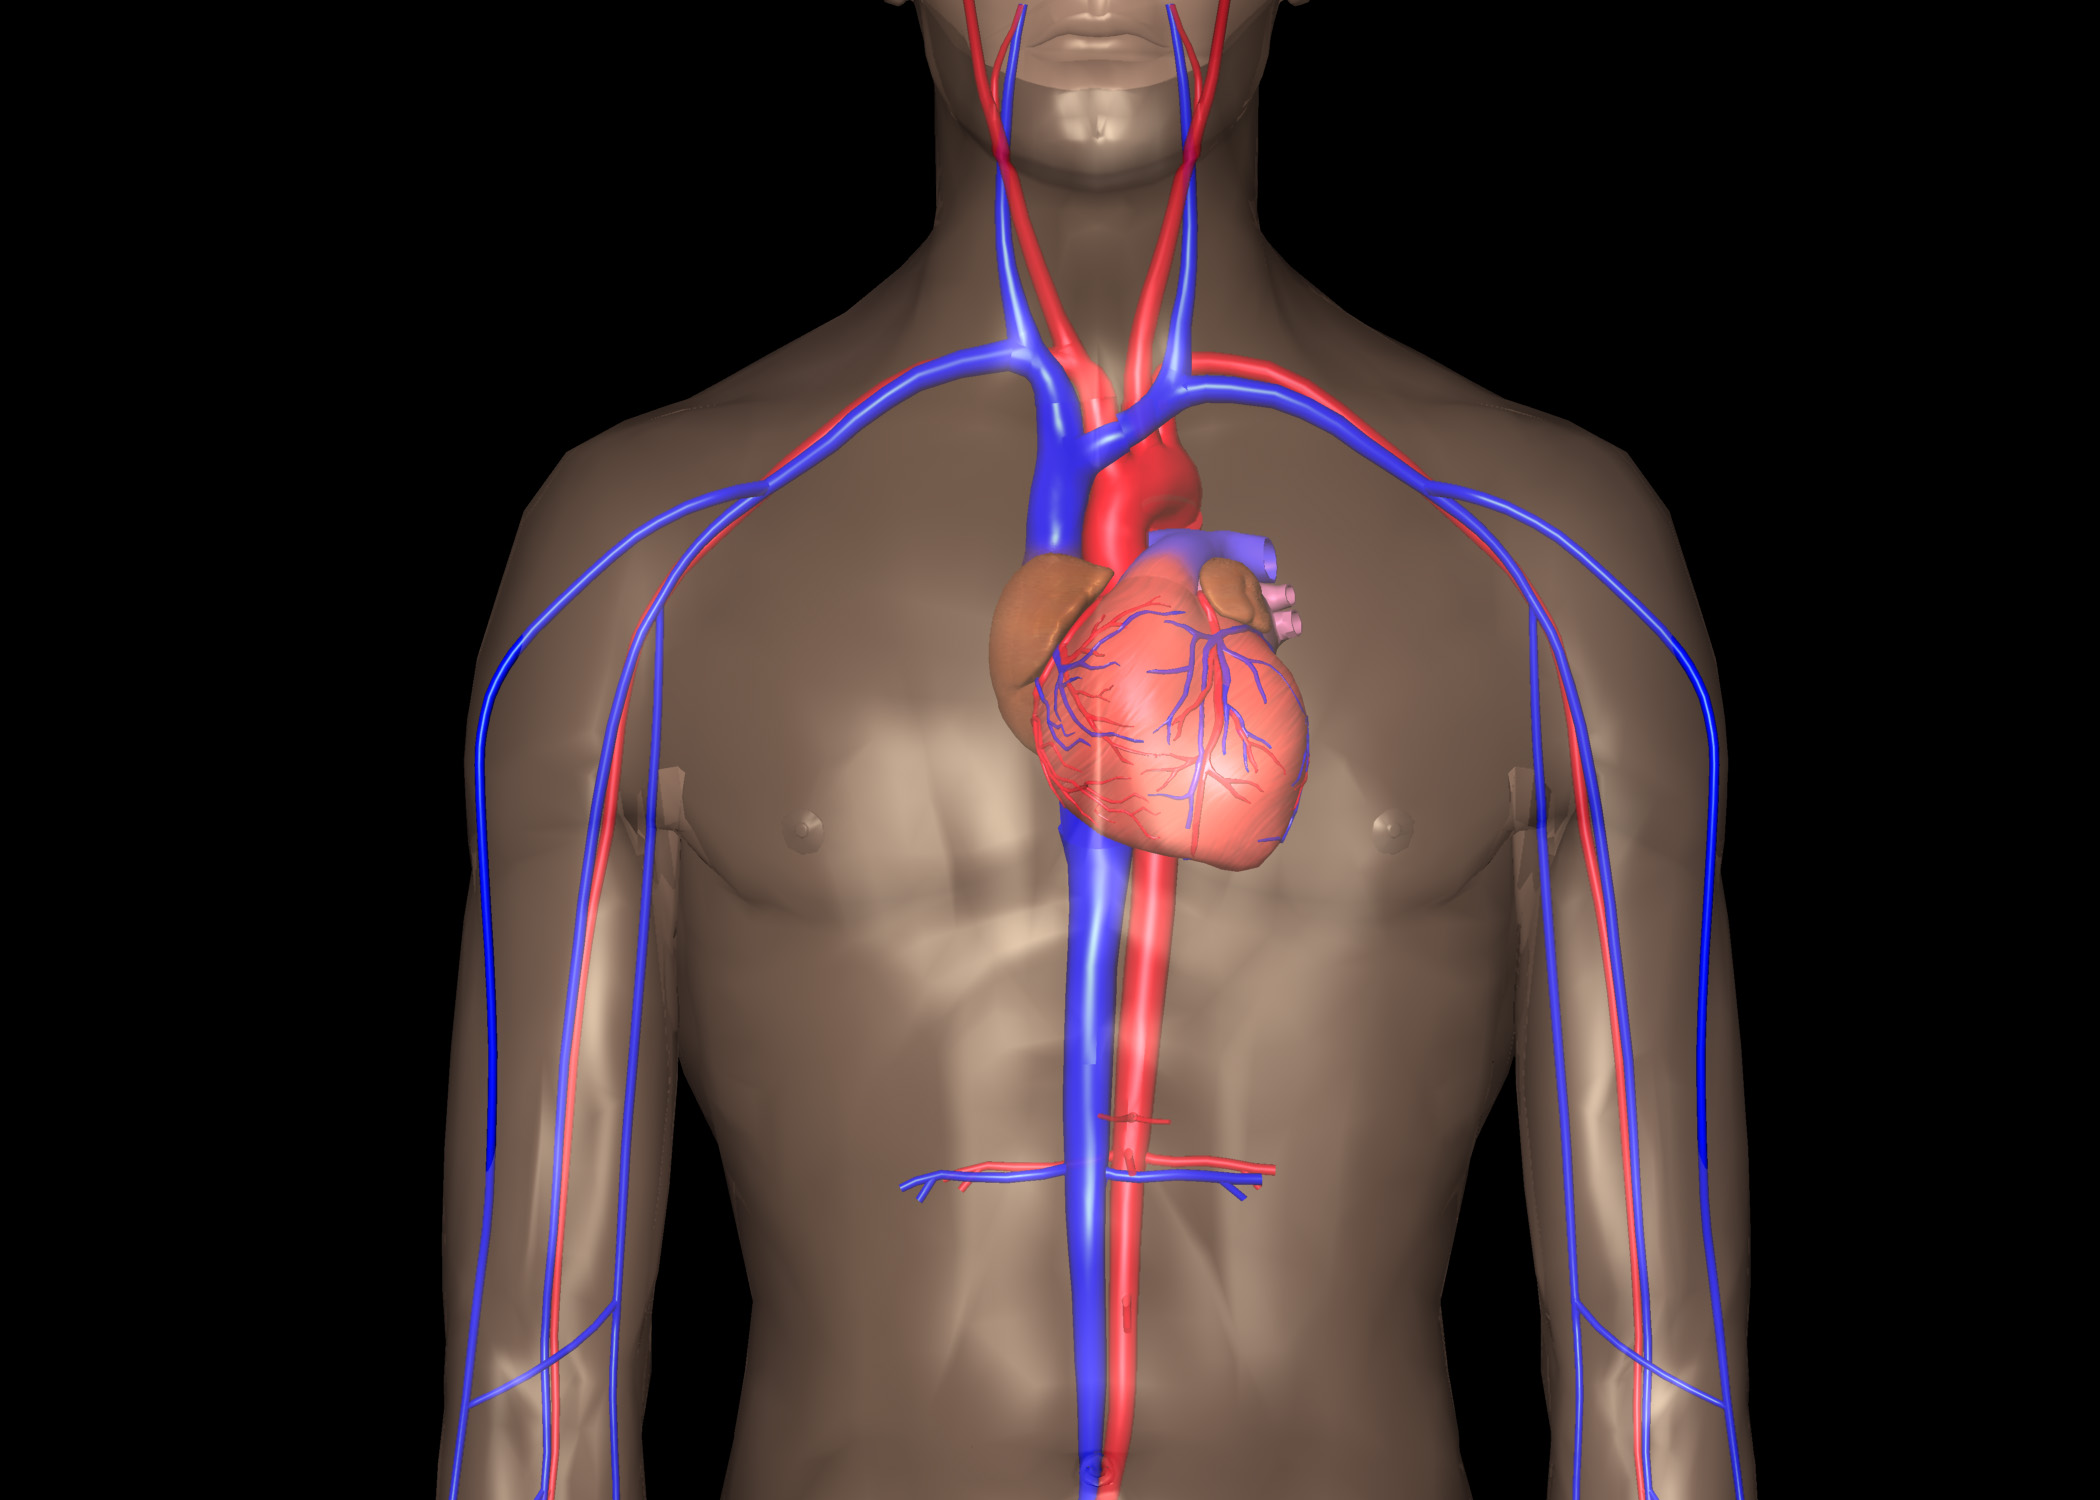 Herz (Cor, Kardia) - Gesundmed – Medizin und Gesundheit im Web